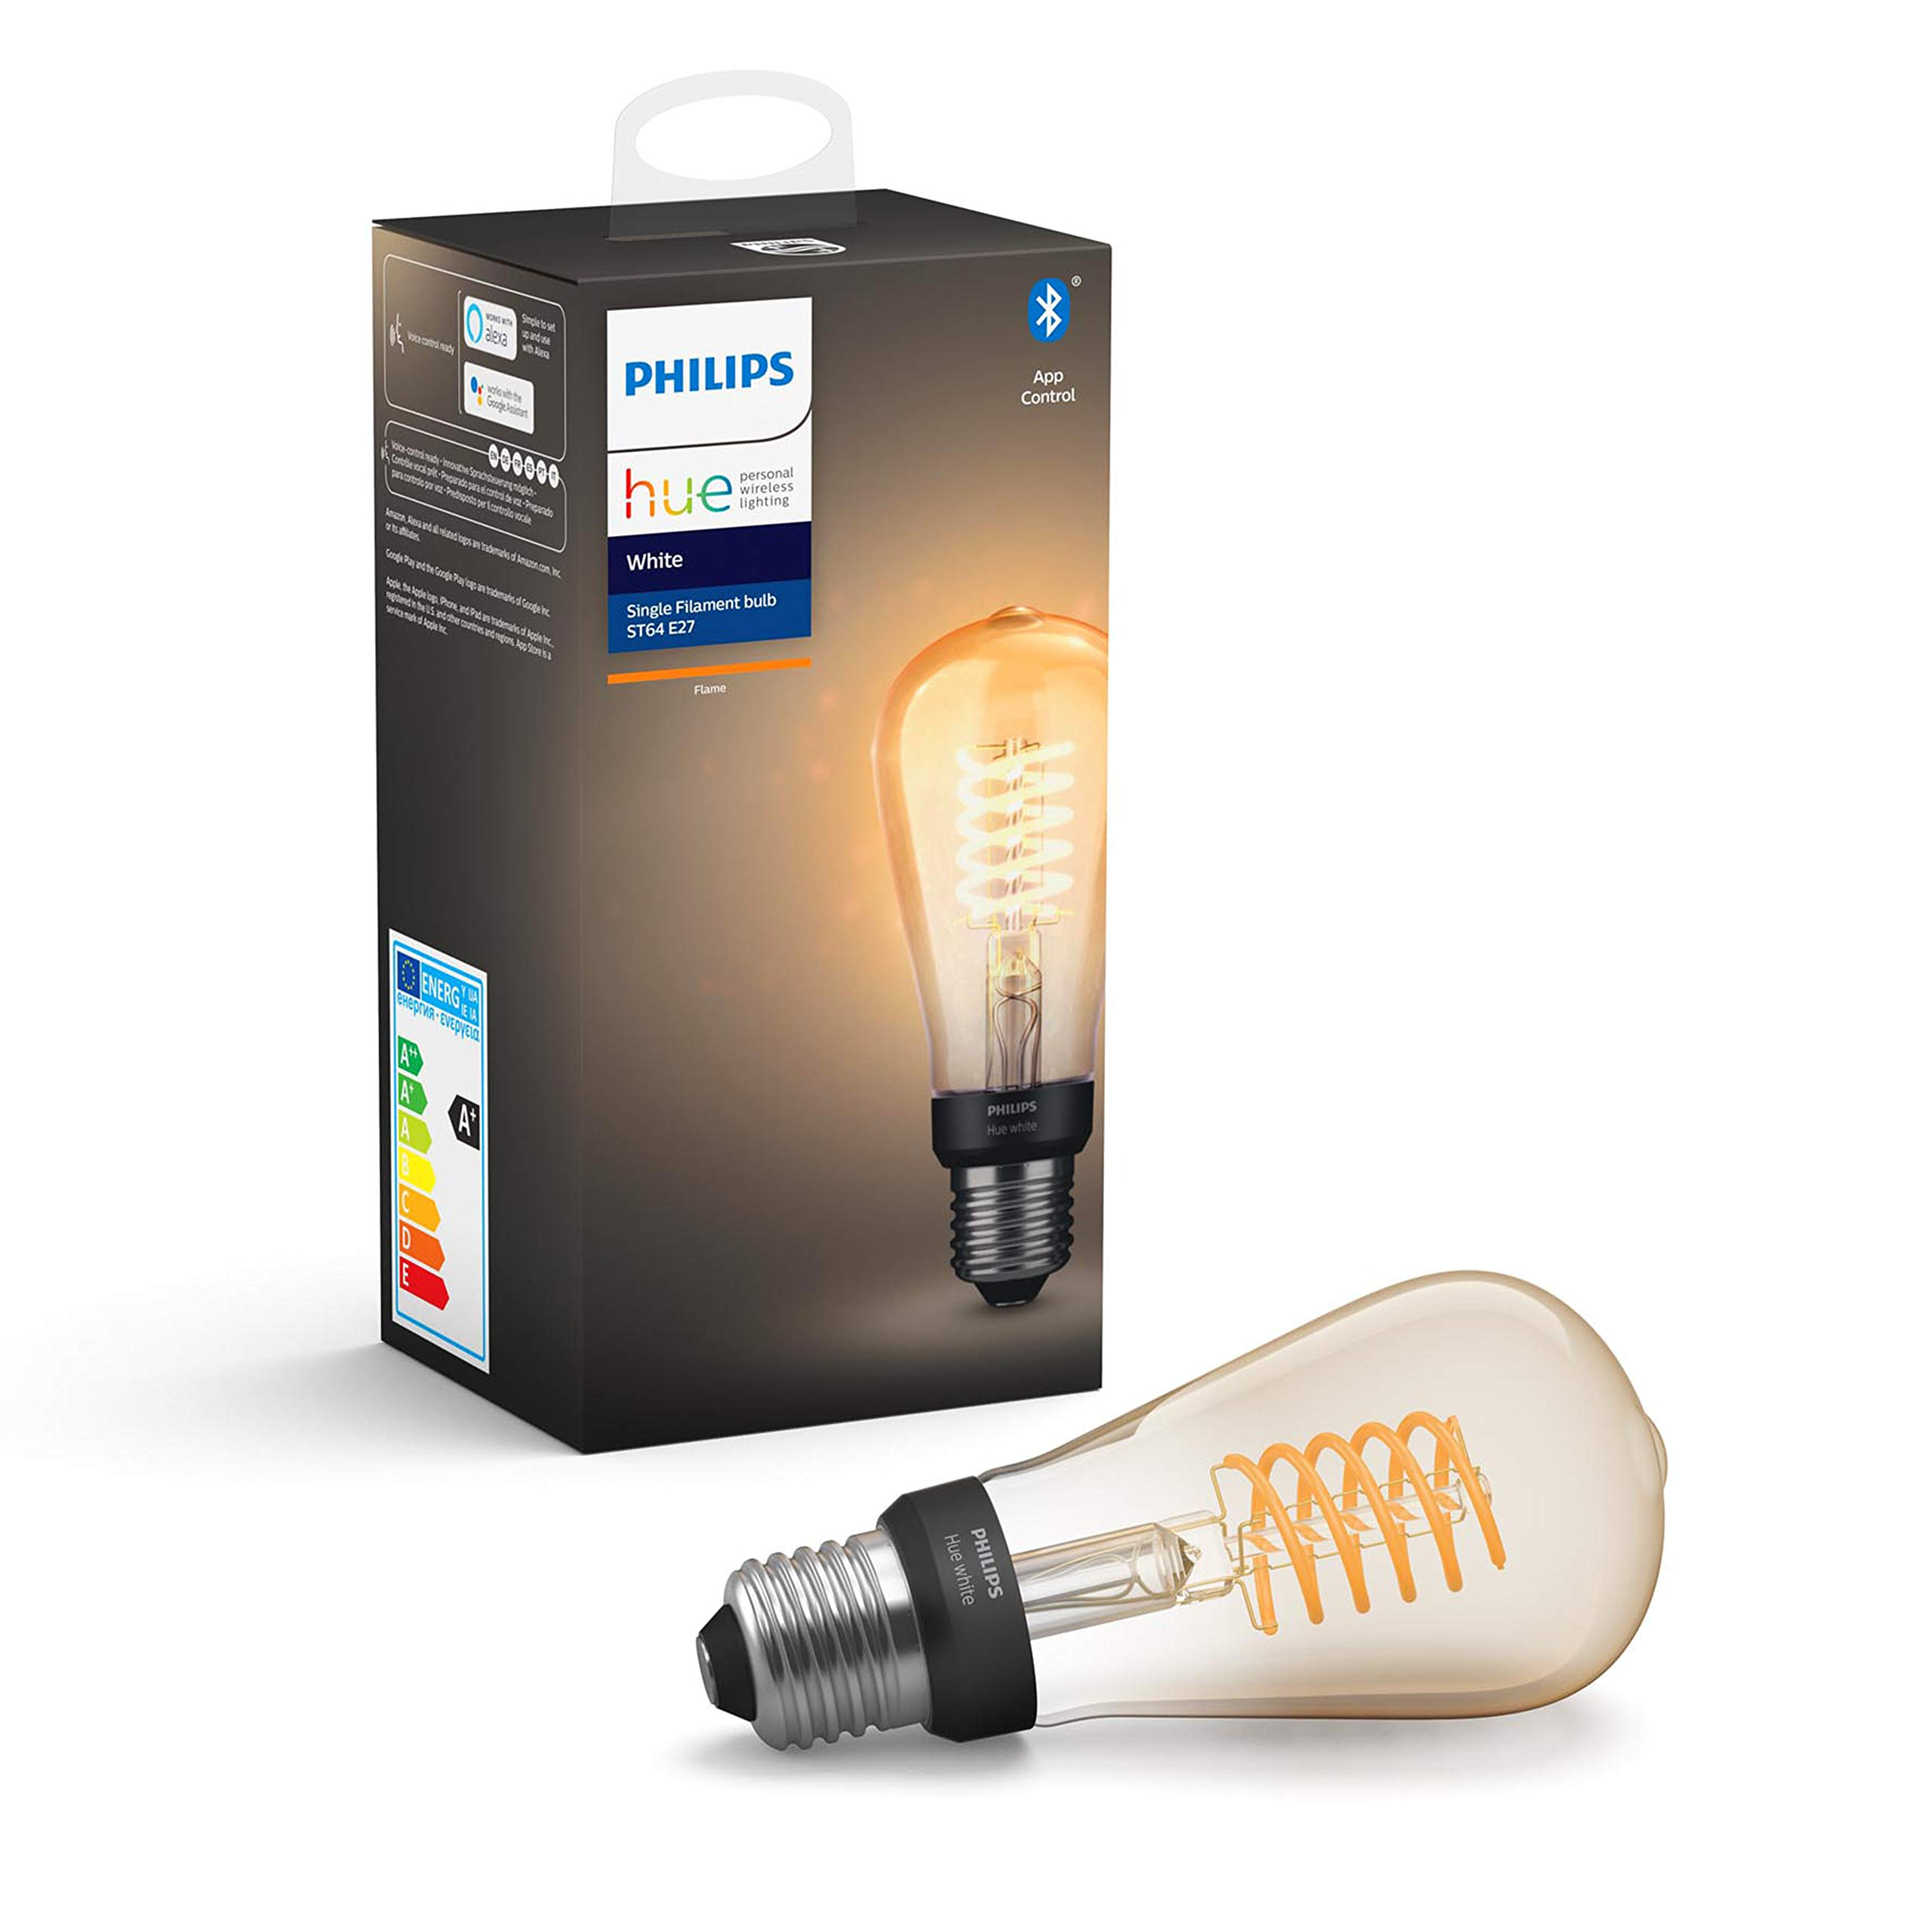 Philips Hue Bombilla Inteligente LED E27, con Bluetooth, Filamento ST64, Luz Blanca Cálida, Compatible con Alexa y Google Home